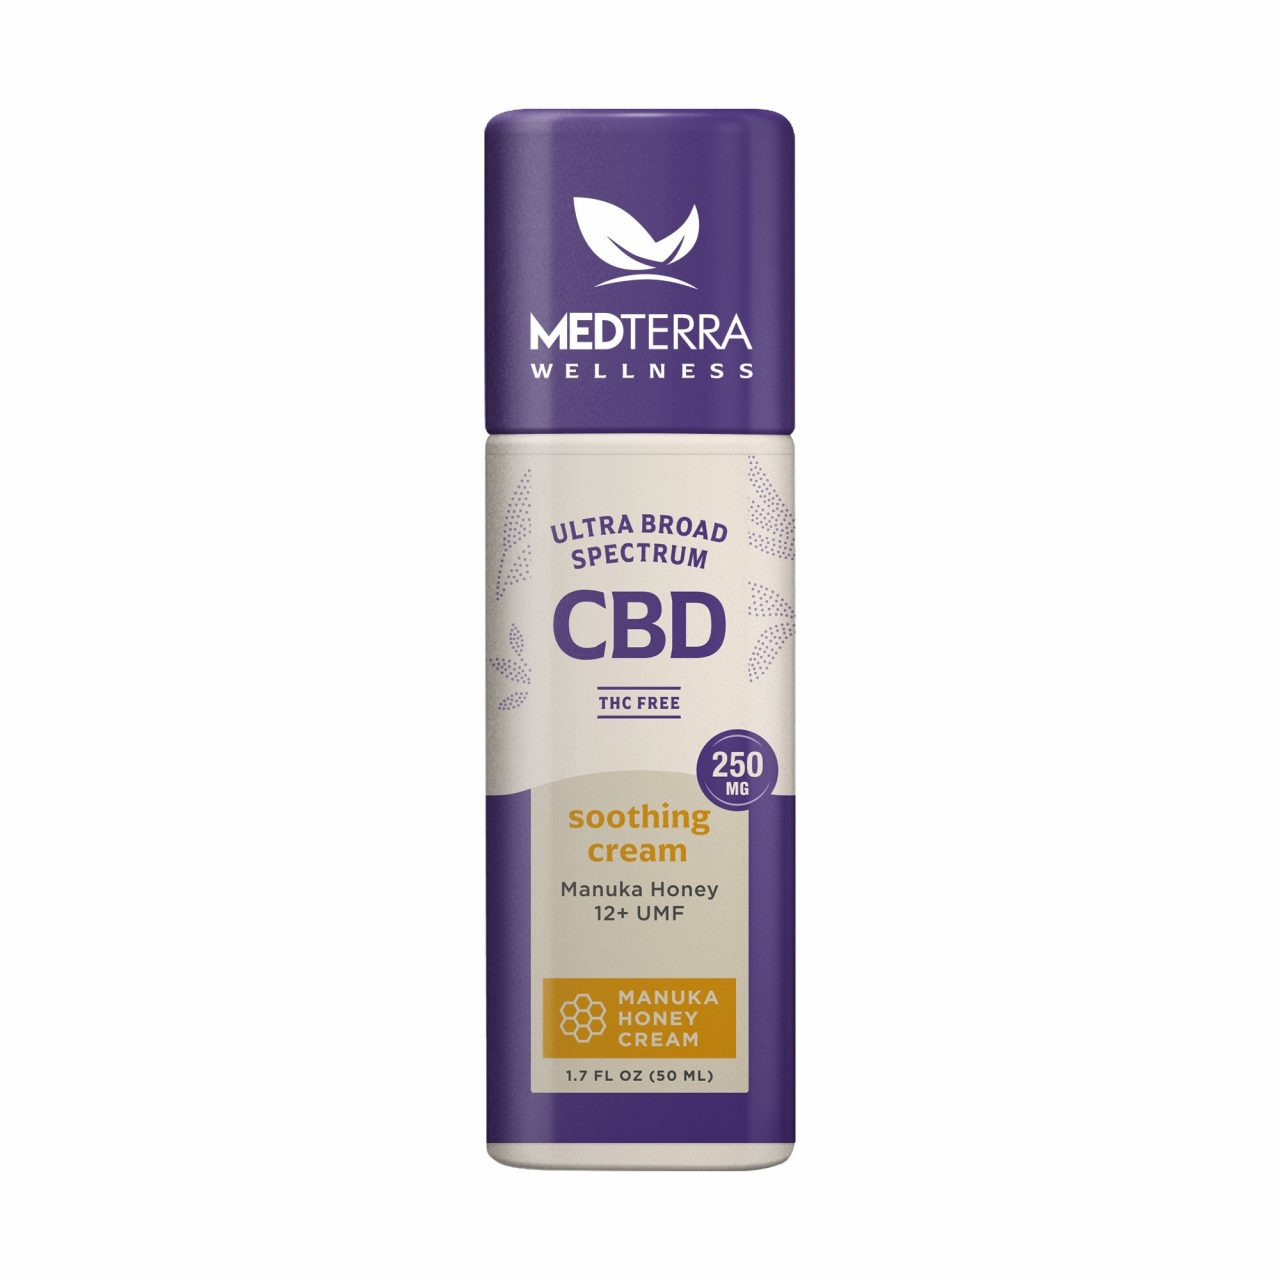 Medterra, Wellness Soothing CBD Cream, Manuka Honey, Broad Spectrum THC-Free, 1.7oz, 250mg CBD 1